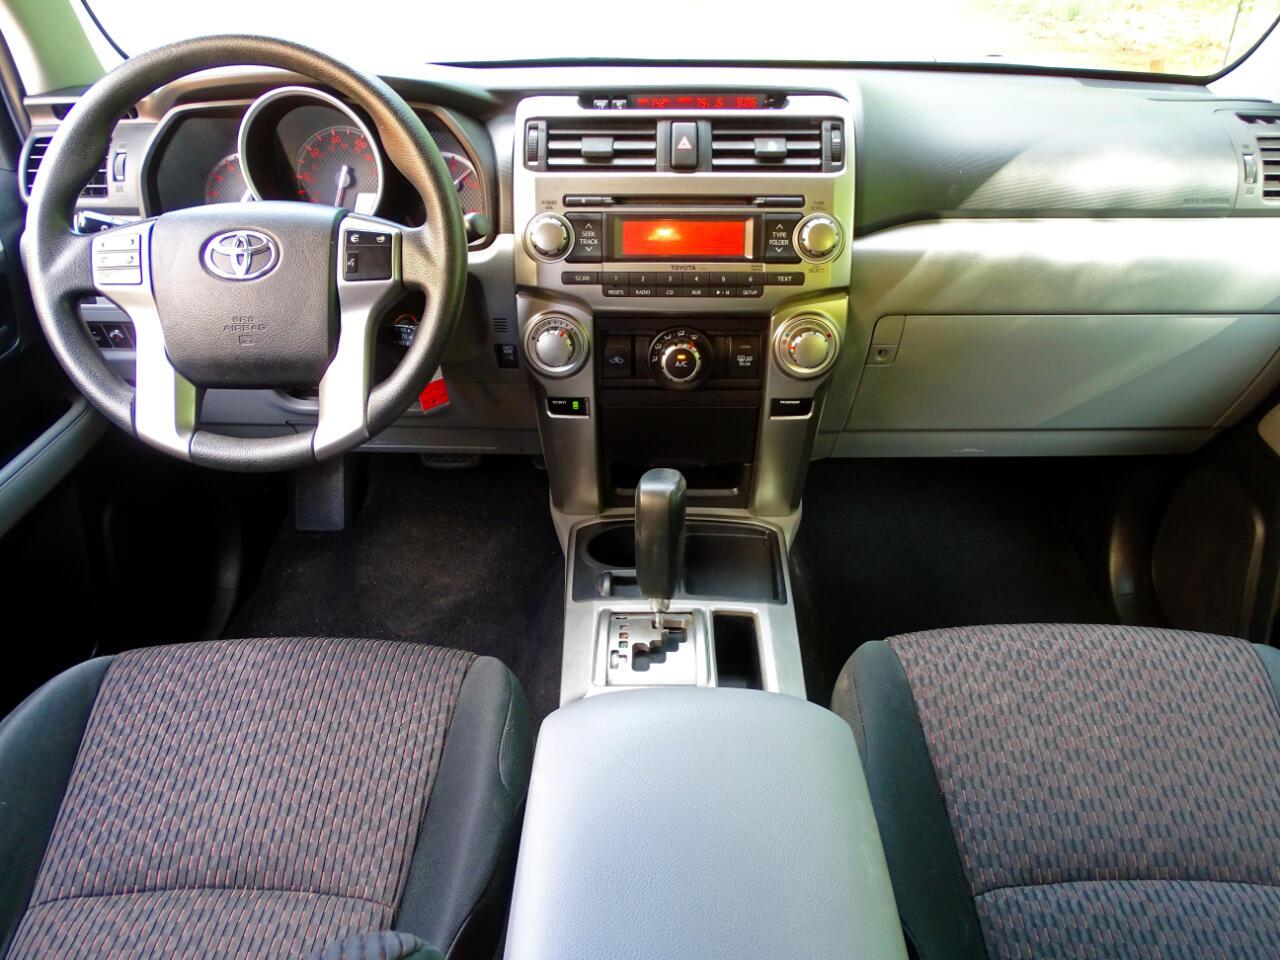 2013 Toyota 4Runner RWD 4dr V6 Limited (Natl)